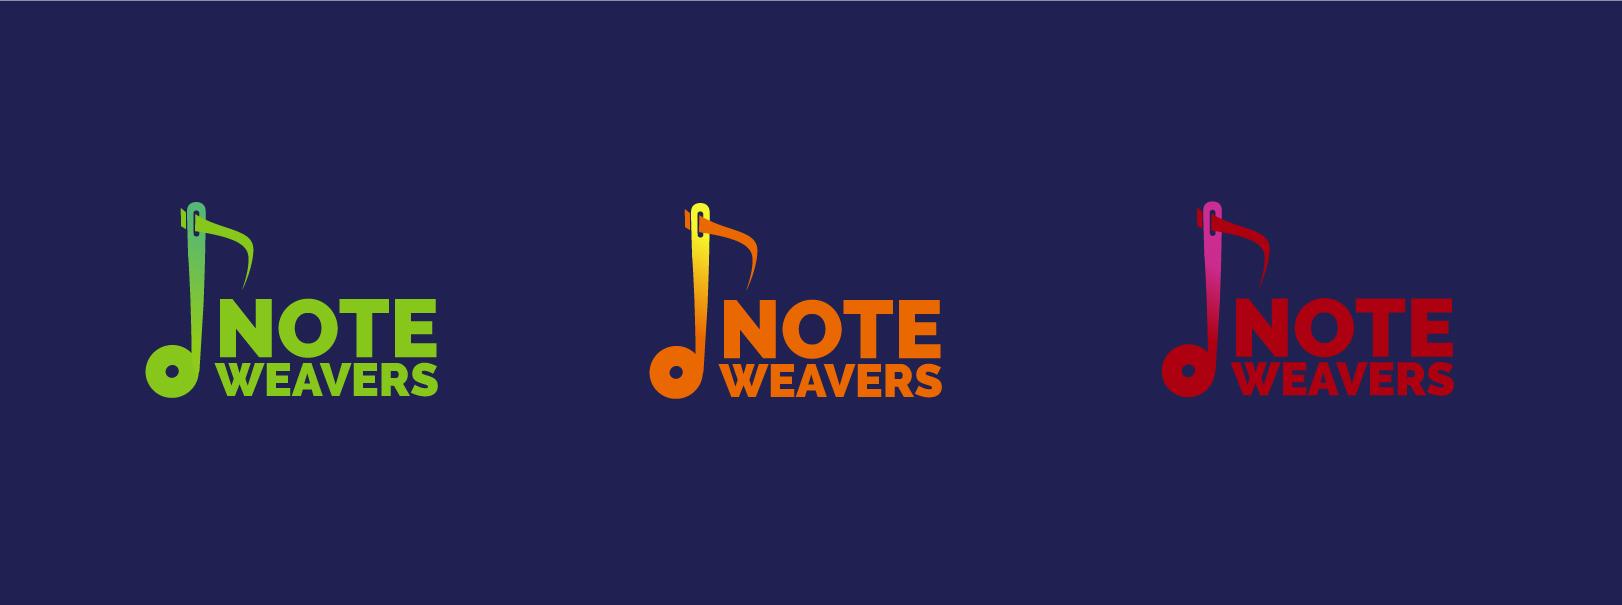 Note Weavers Utter Creatives